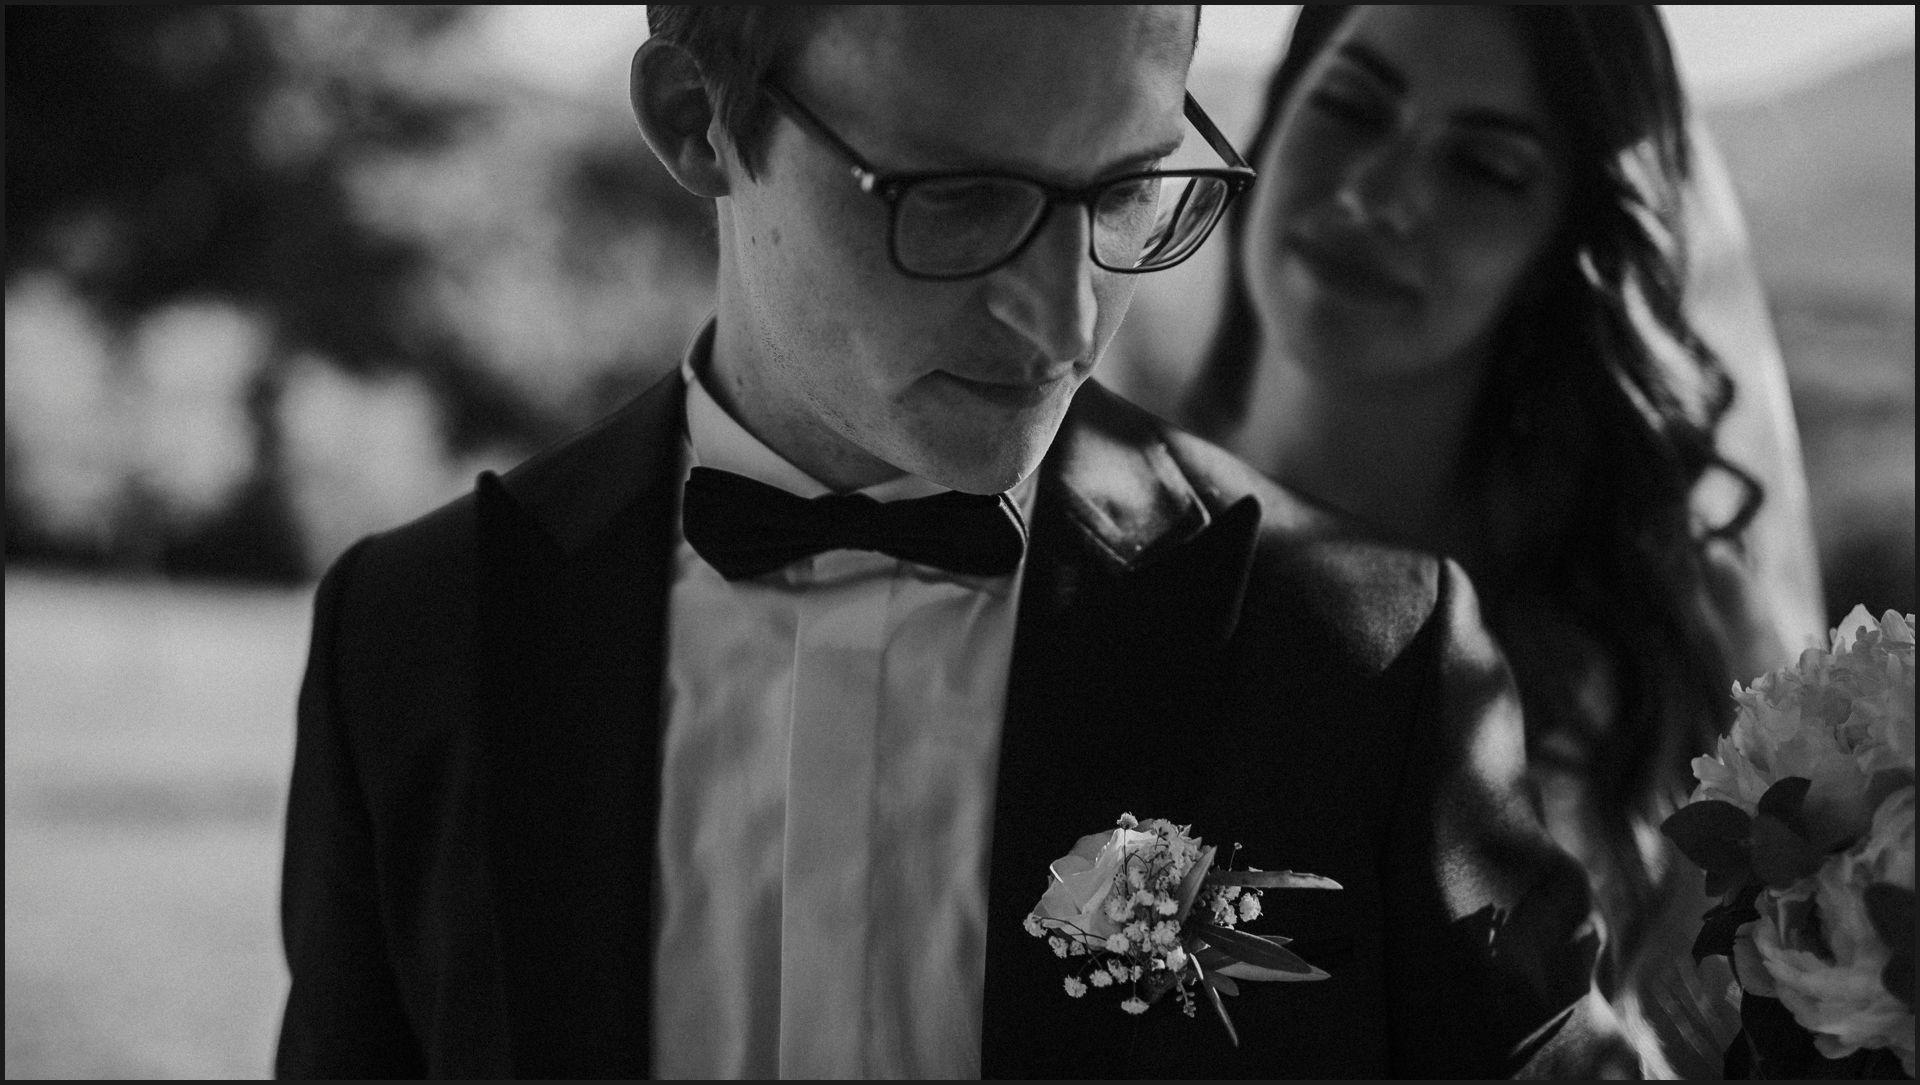 black and white, wedding, umbria, nikis resort, bride, groom, drama